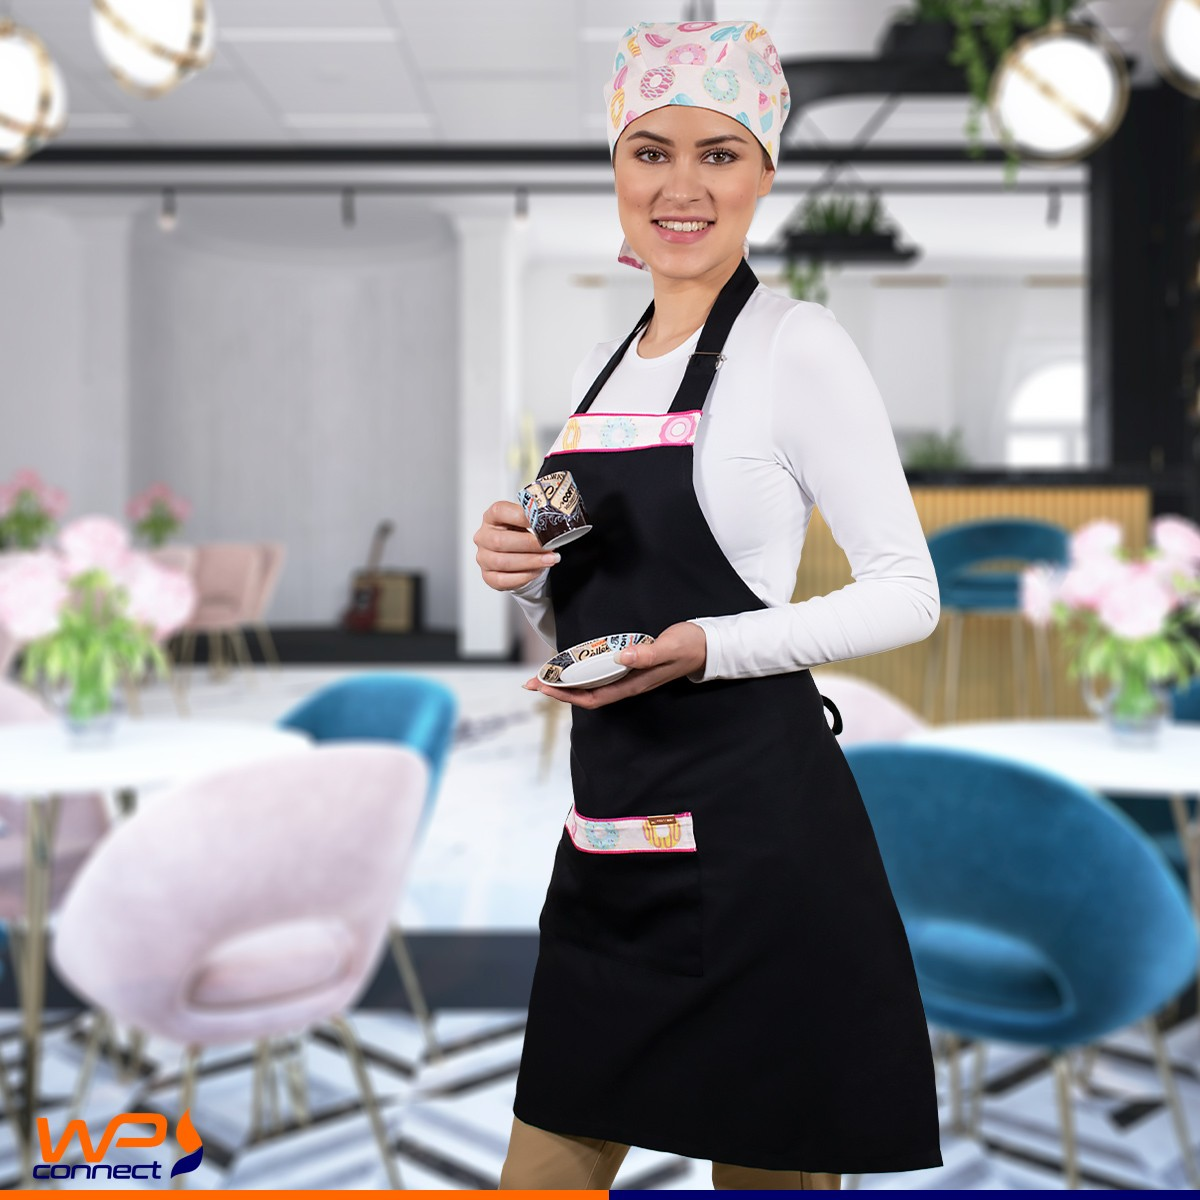 Avental de Cozinha Bandana Chef Barista Estampa Cupcake